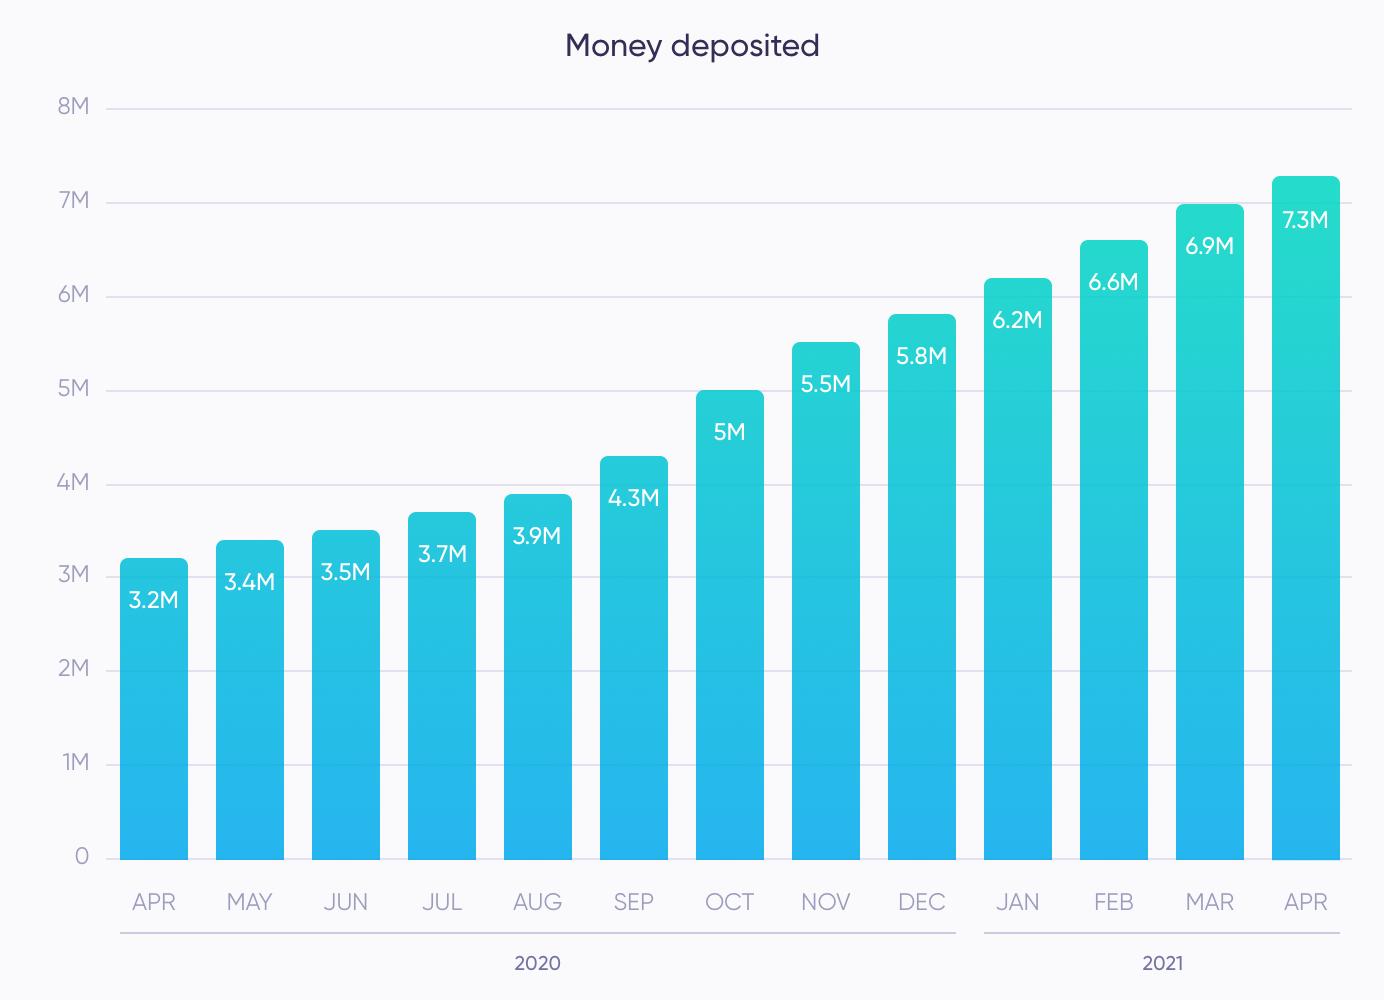 Money deposited (April)